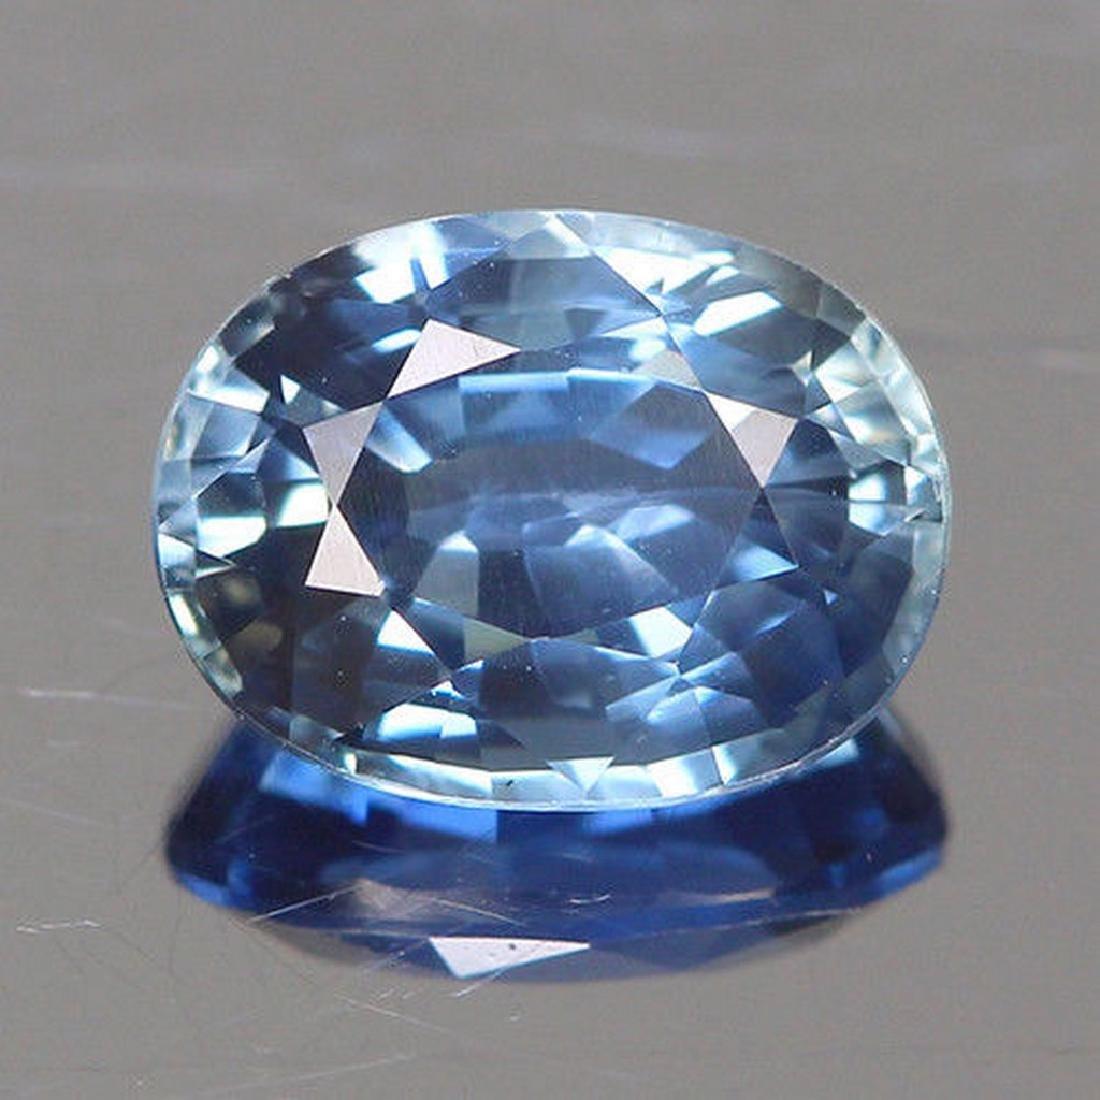 1.09 ct Sri Lanka Sapphire